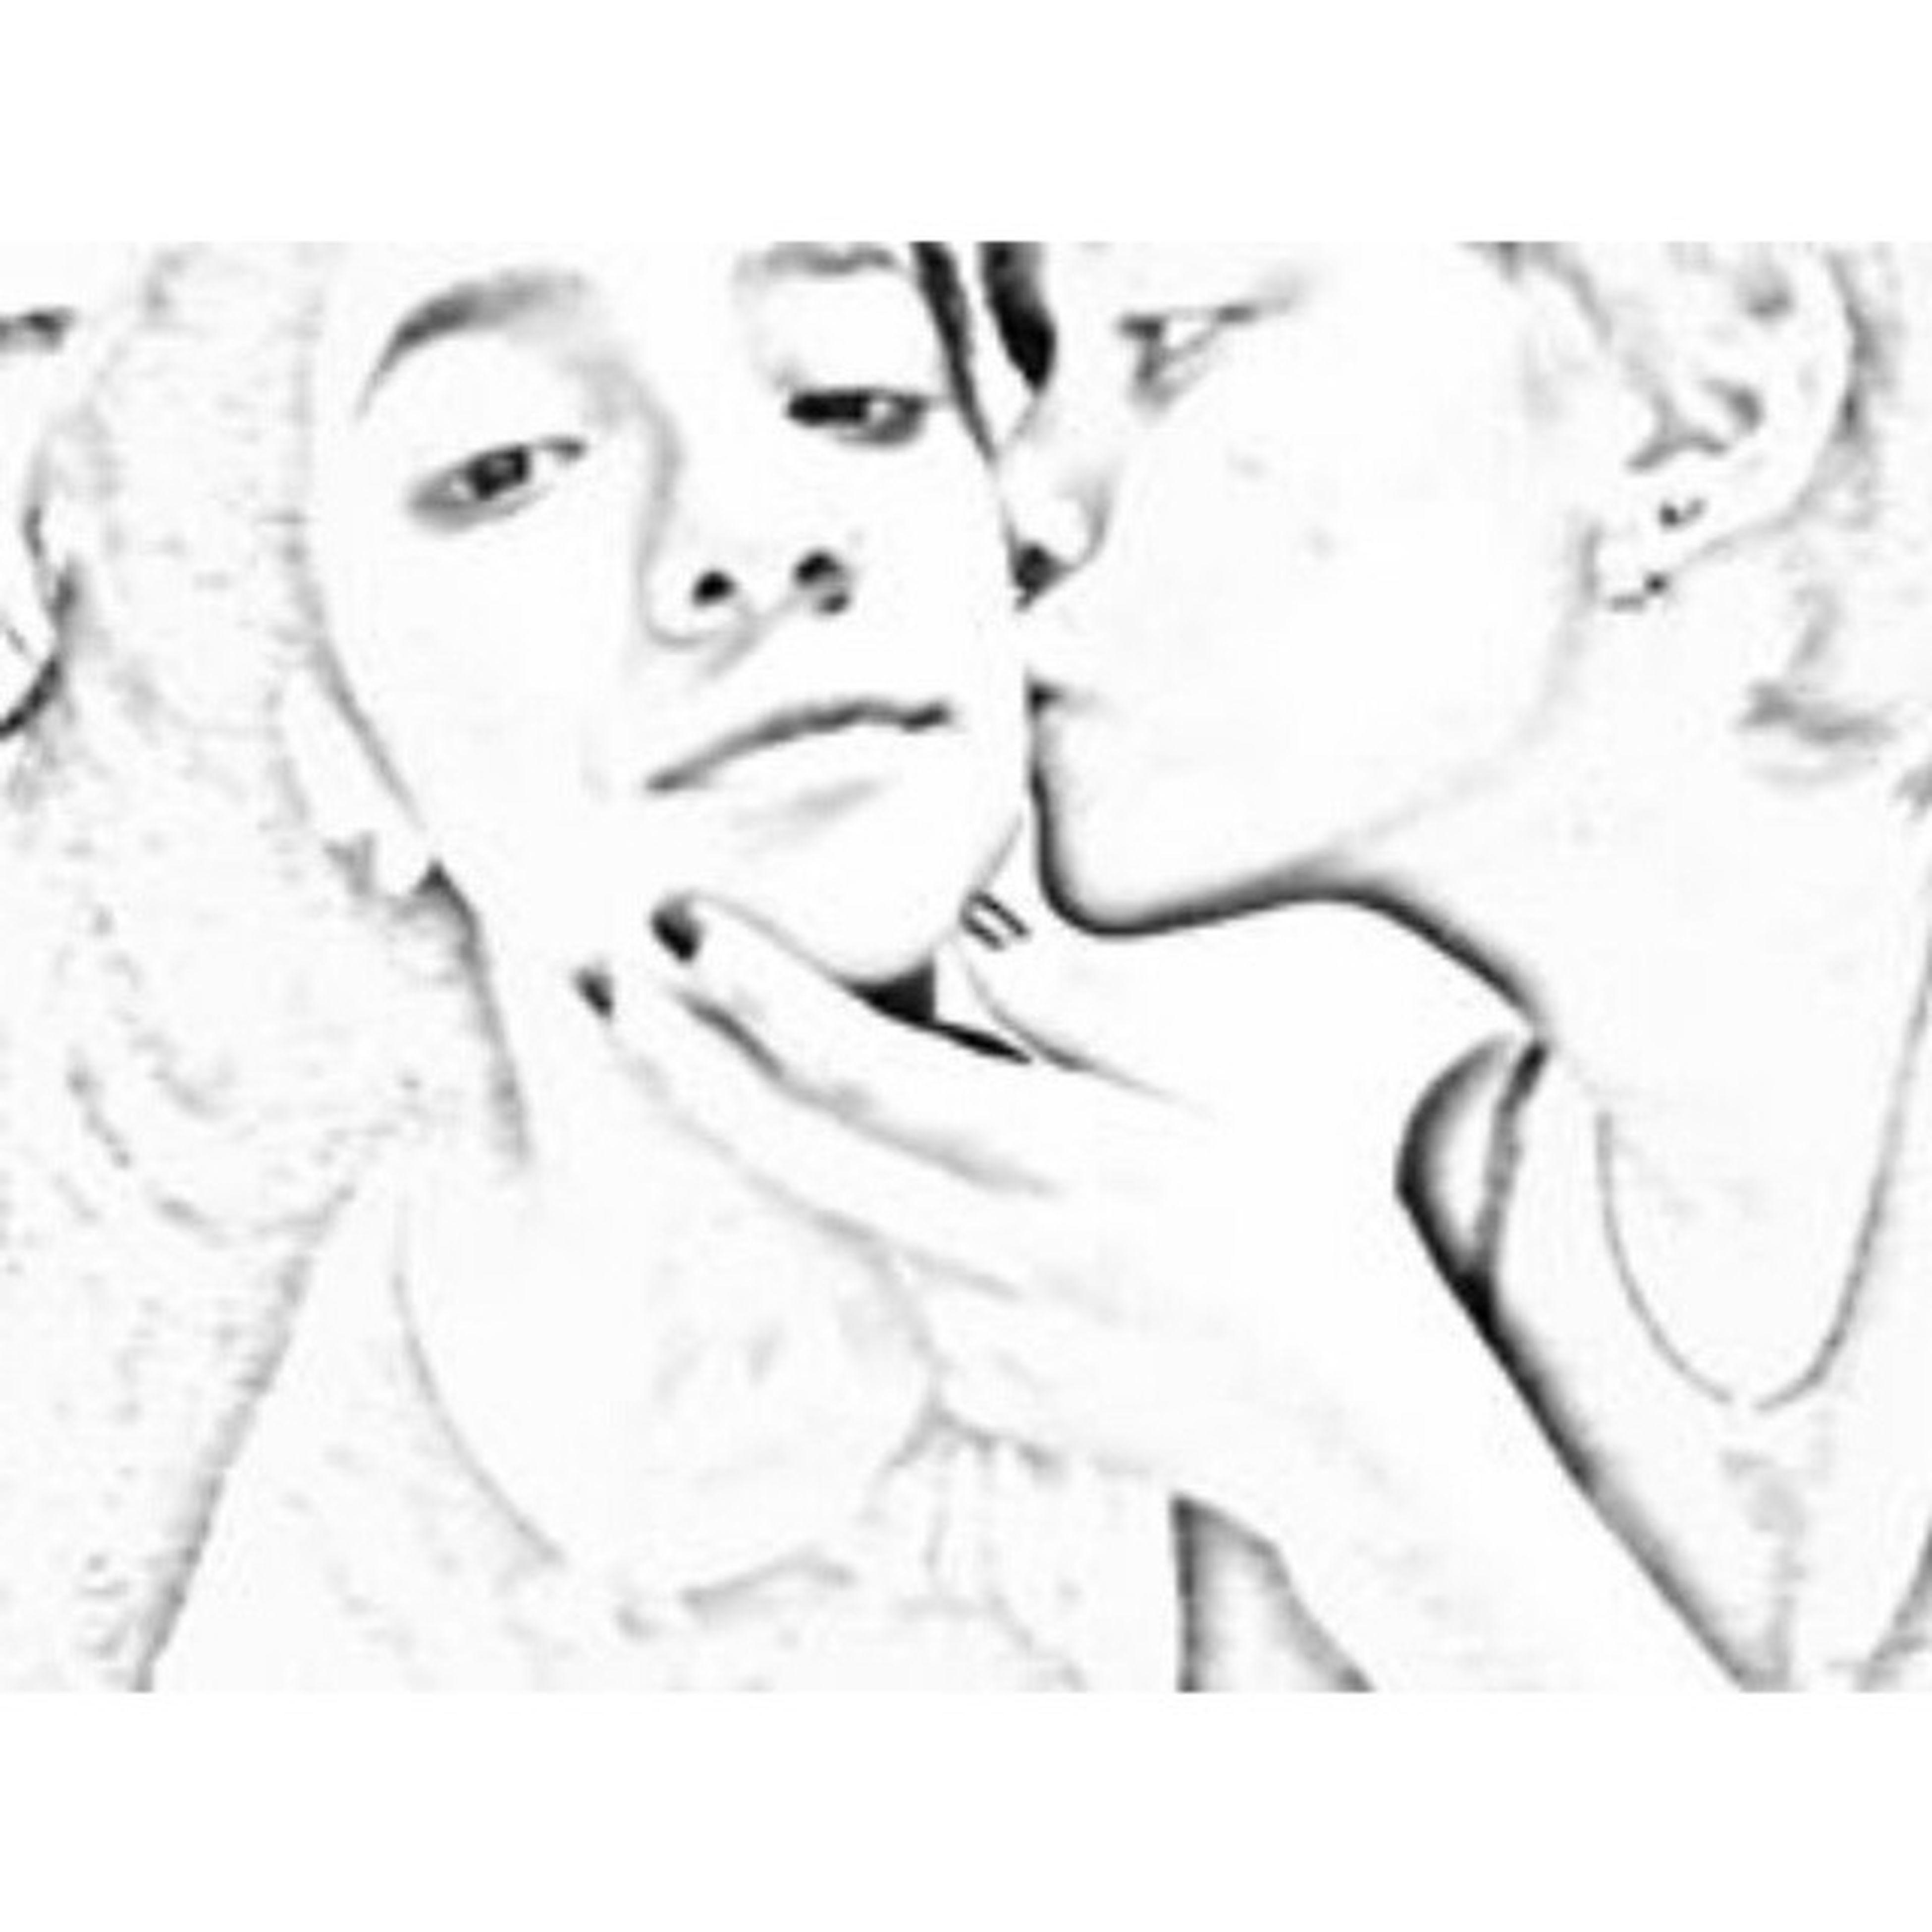 Te amo muchísimo mi bonita Drawing Blackandwhite Today Night Friend LB4 Love Kiss Beautiful Sweet Cute Loving Demostration Pencil Girls MyBlacki Mia